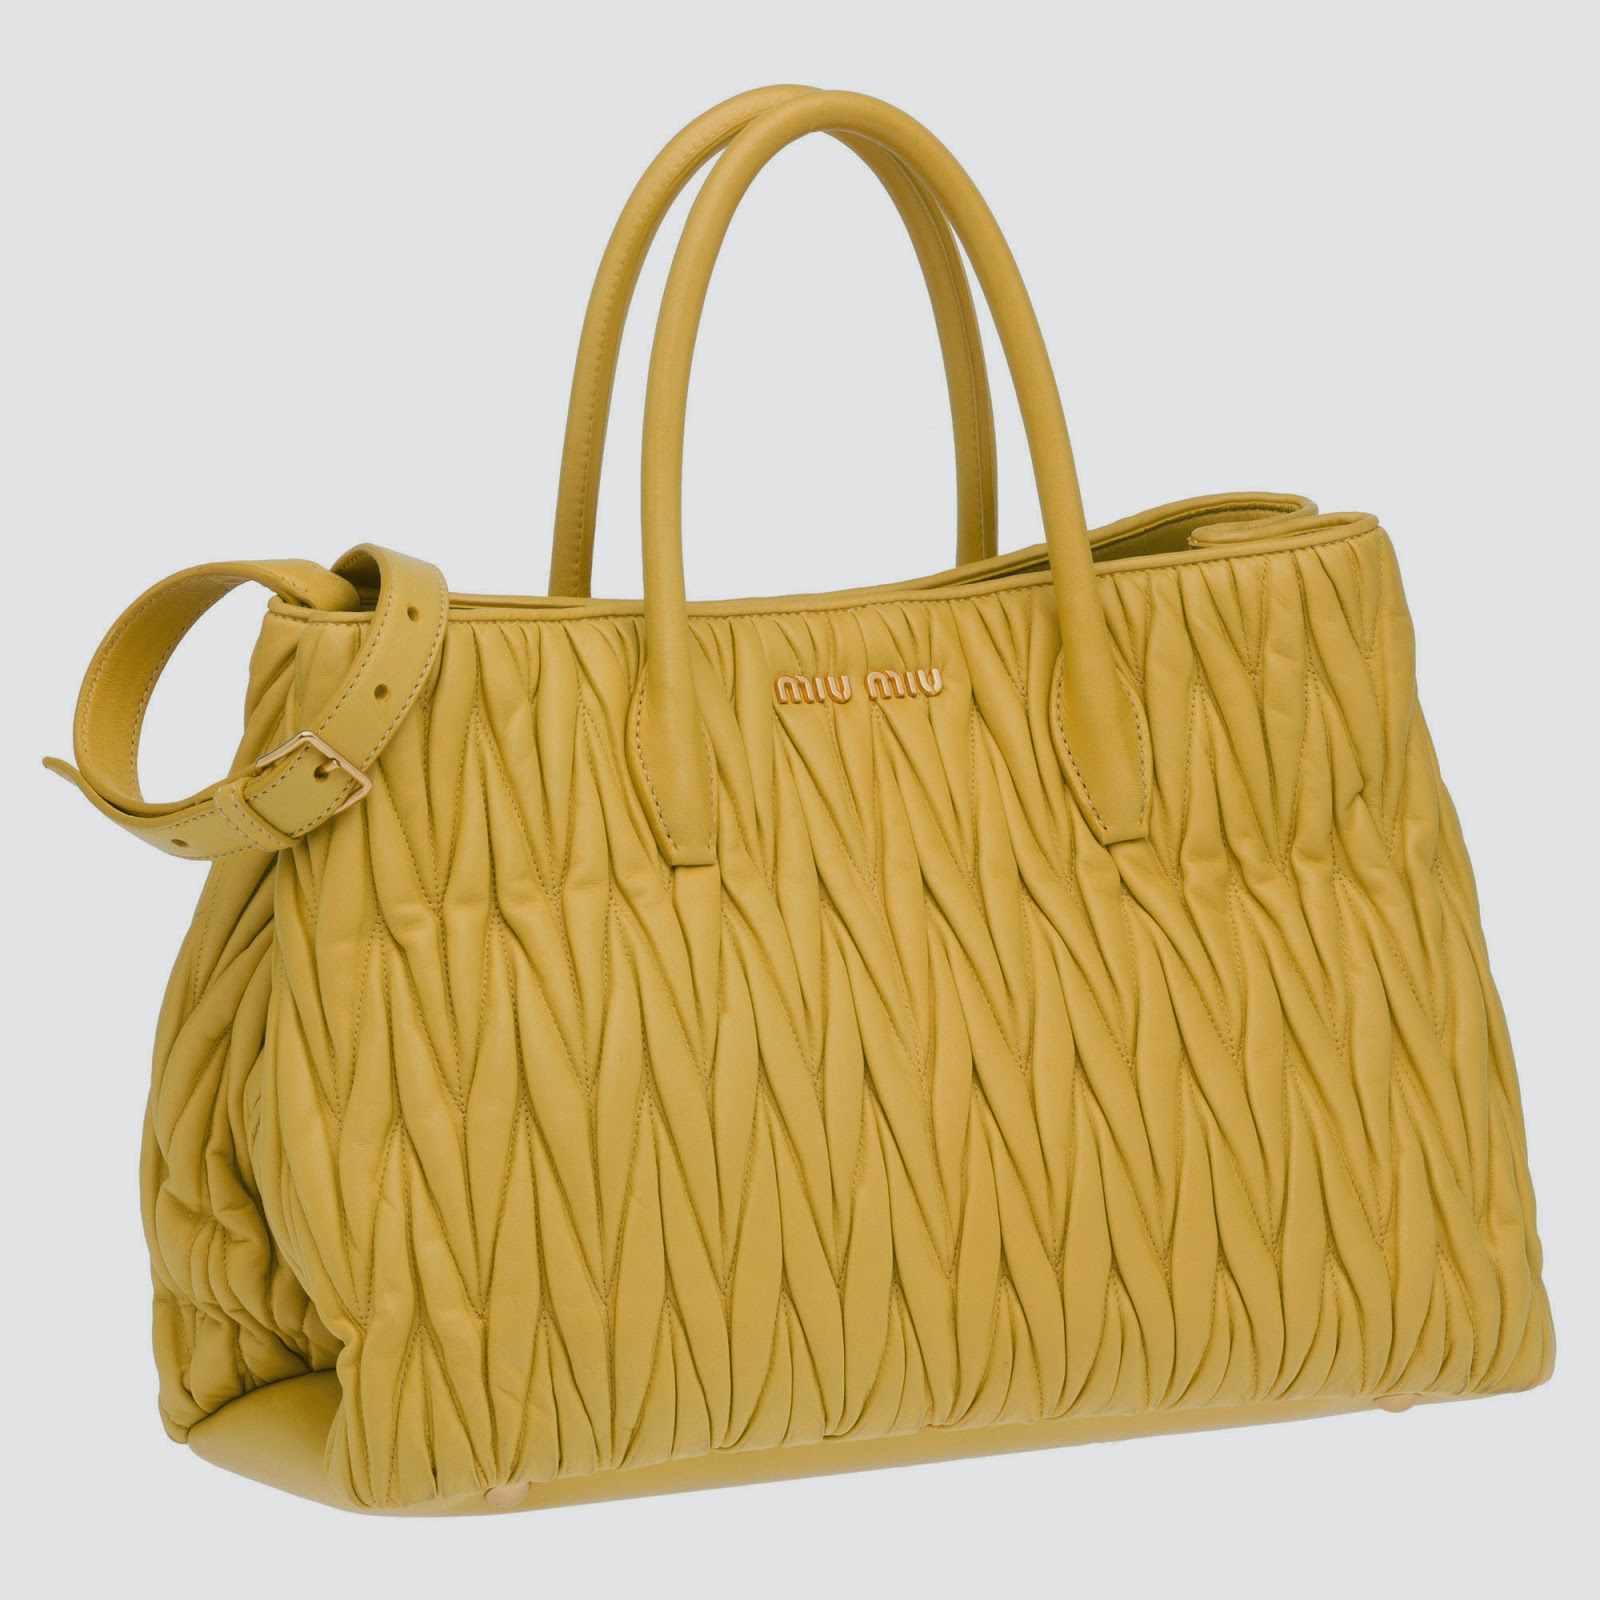 sar%25C4%25B1+%25C3%25A7anta Miu Miu Herbst Winter 2014 Handtaschen Modelle